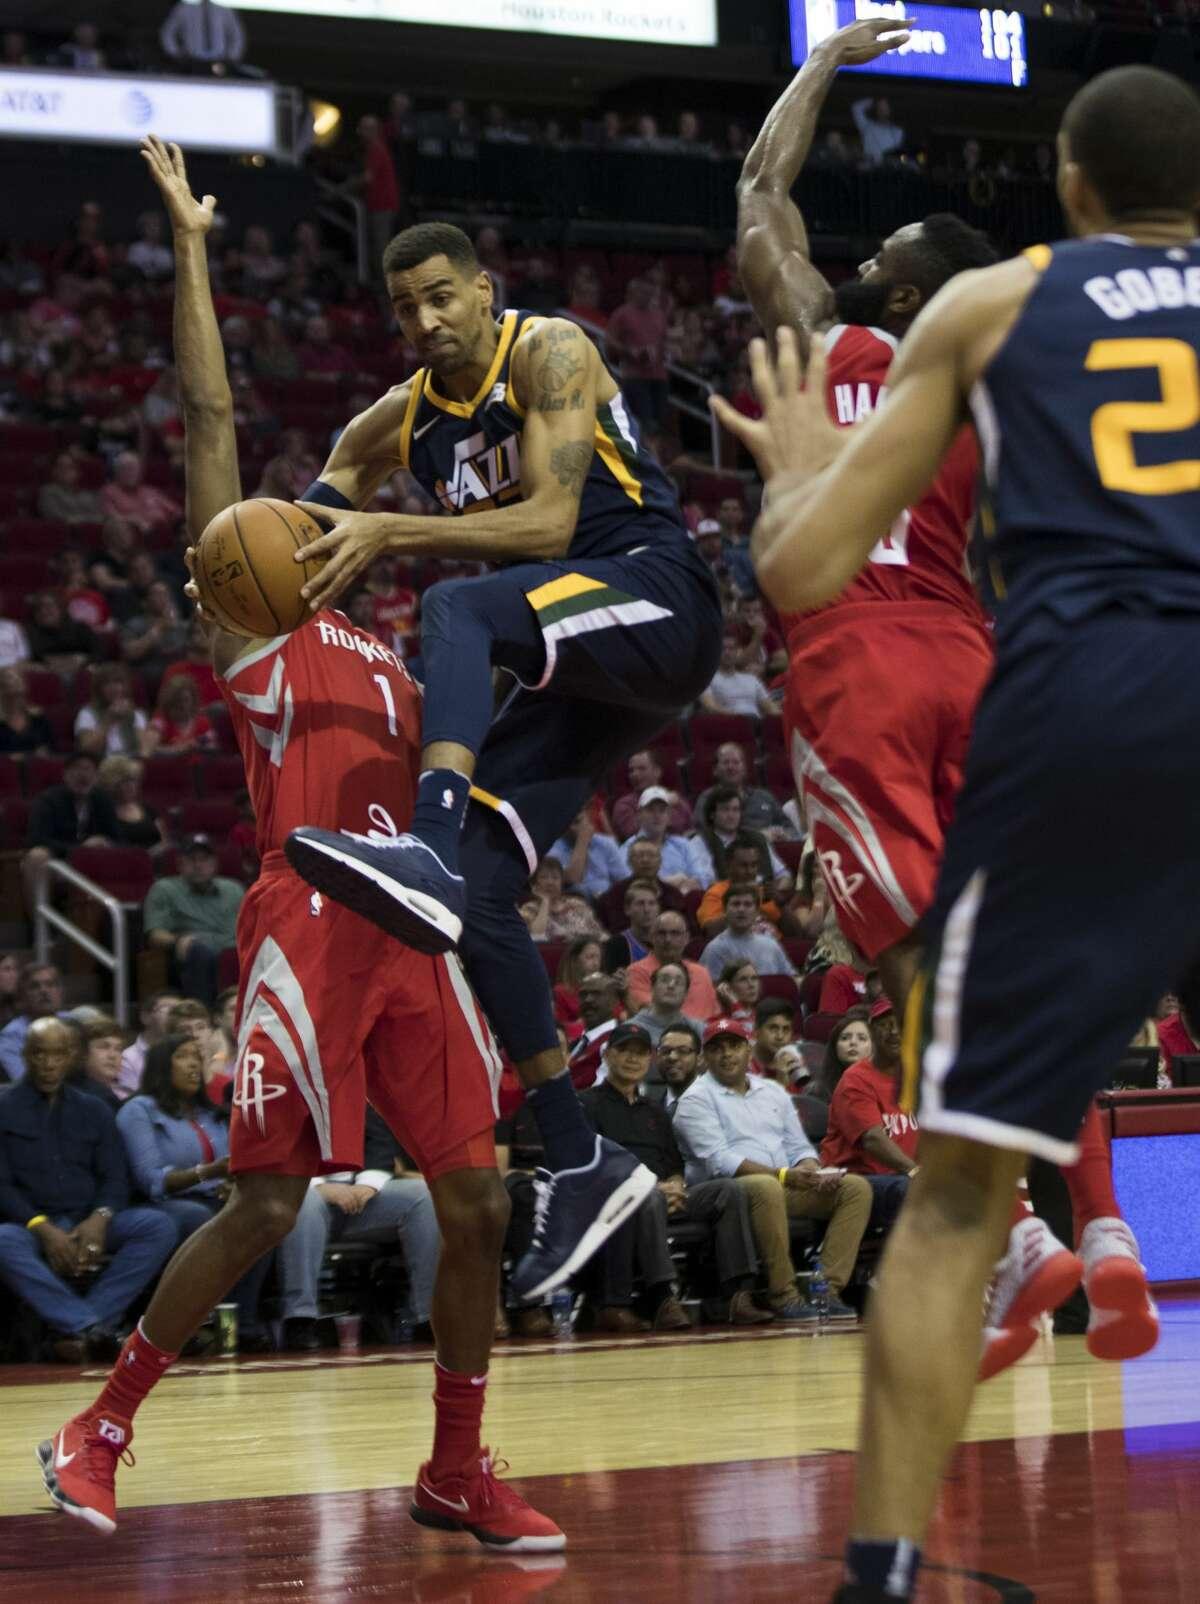 Utah Jazz forward Thabo Sefolosha (22) drives under the pressure of Houston Rockets forward Trevor Ariza (1) and Houston Rockets guard James Harden (13) on Sunday, Nov. 5, 2017, in Houston. ( Marie D. De Jesus / Houston Chronicle )